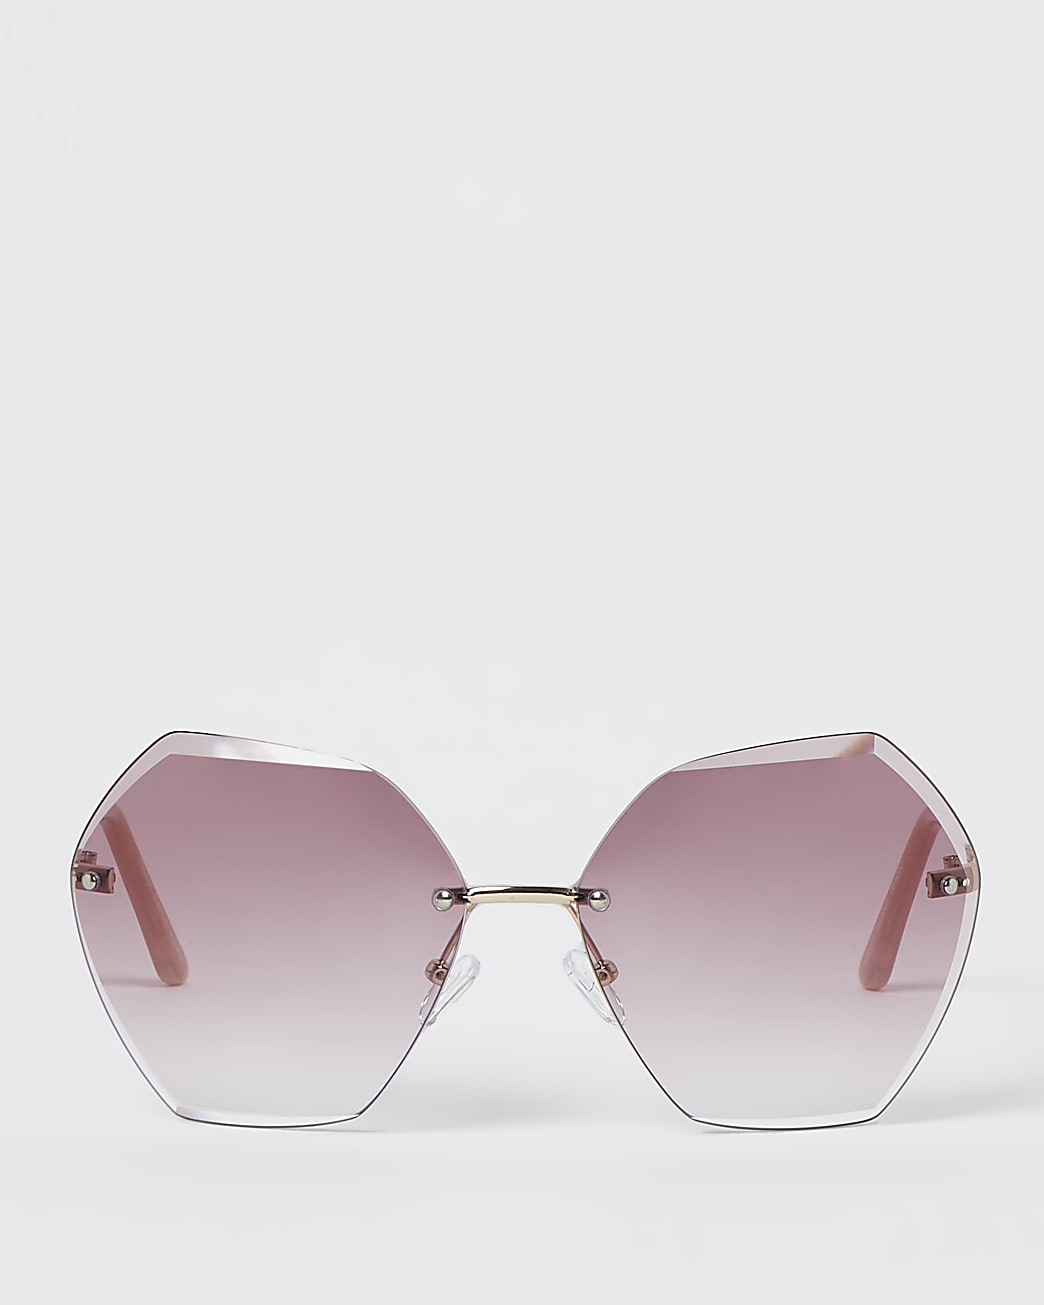 Pink oversized bevelled rimless sunglasses